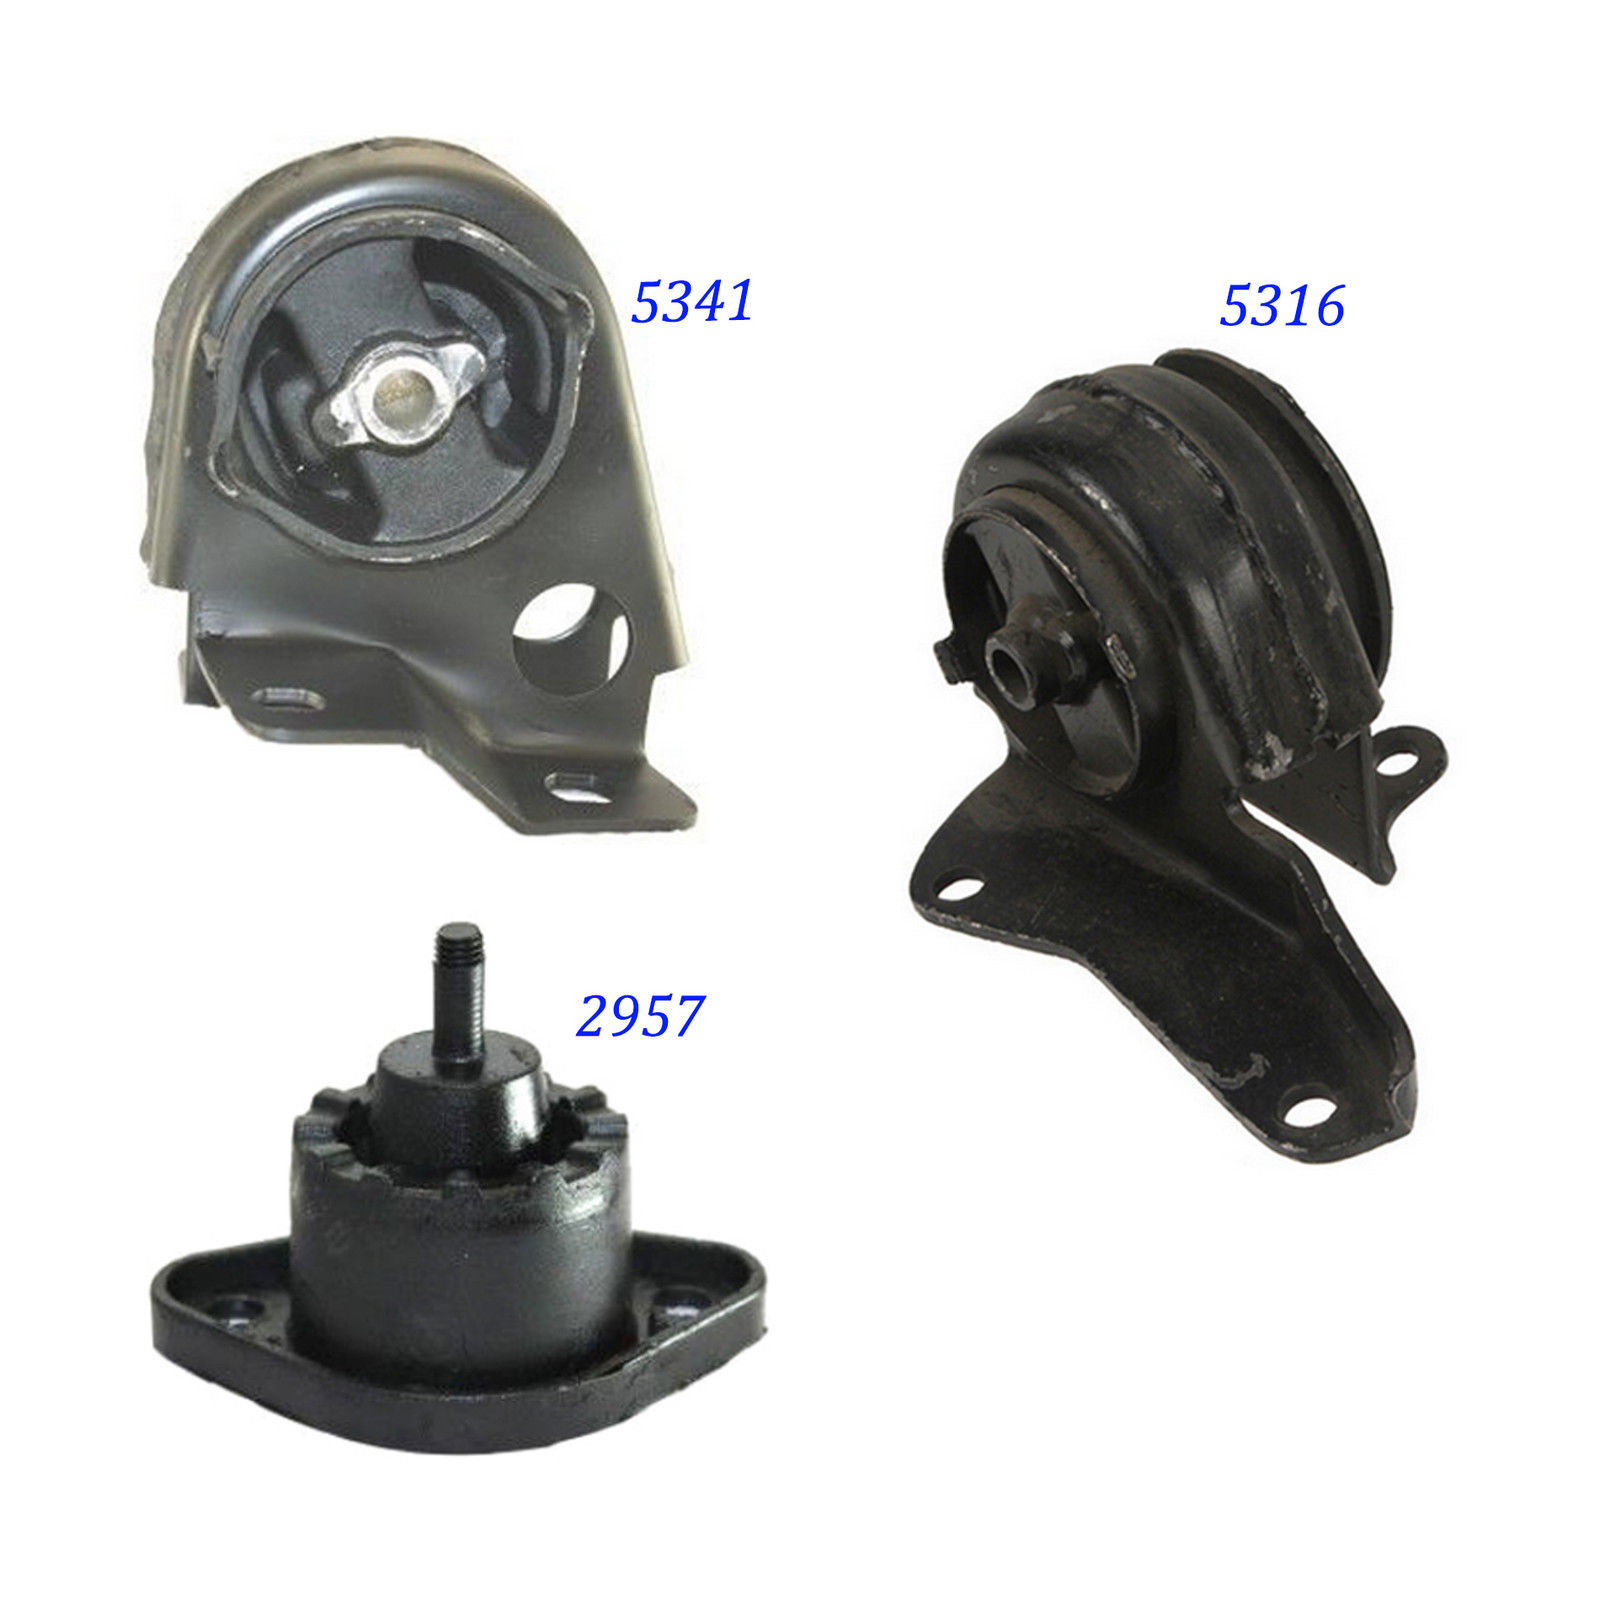 For Chevrolet S10//GMC Sonoma 2.2L Engine /& Trans Mount Auto Set 2957 5316 5341